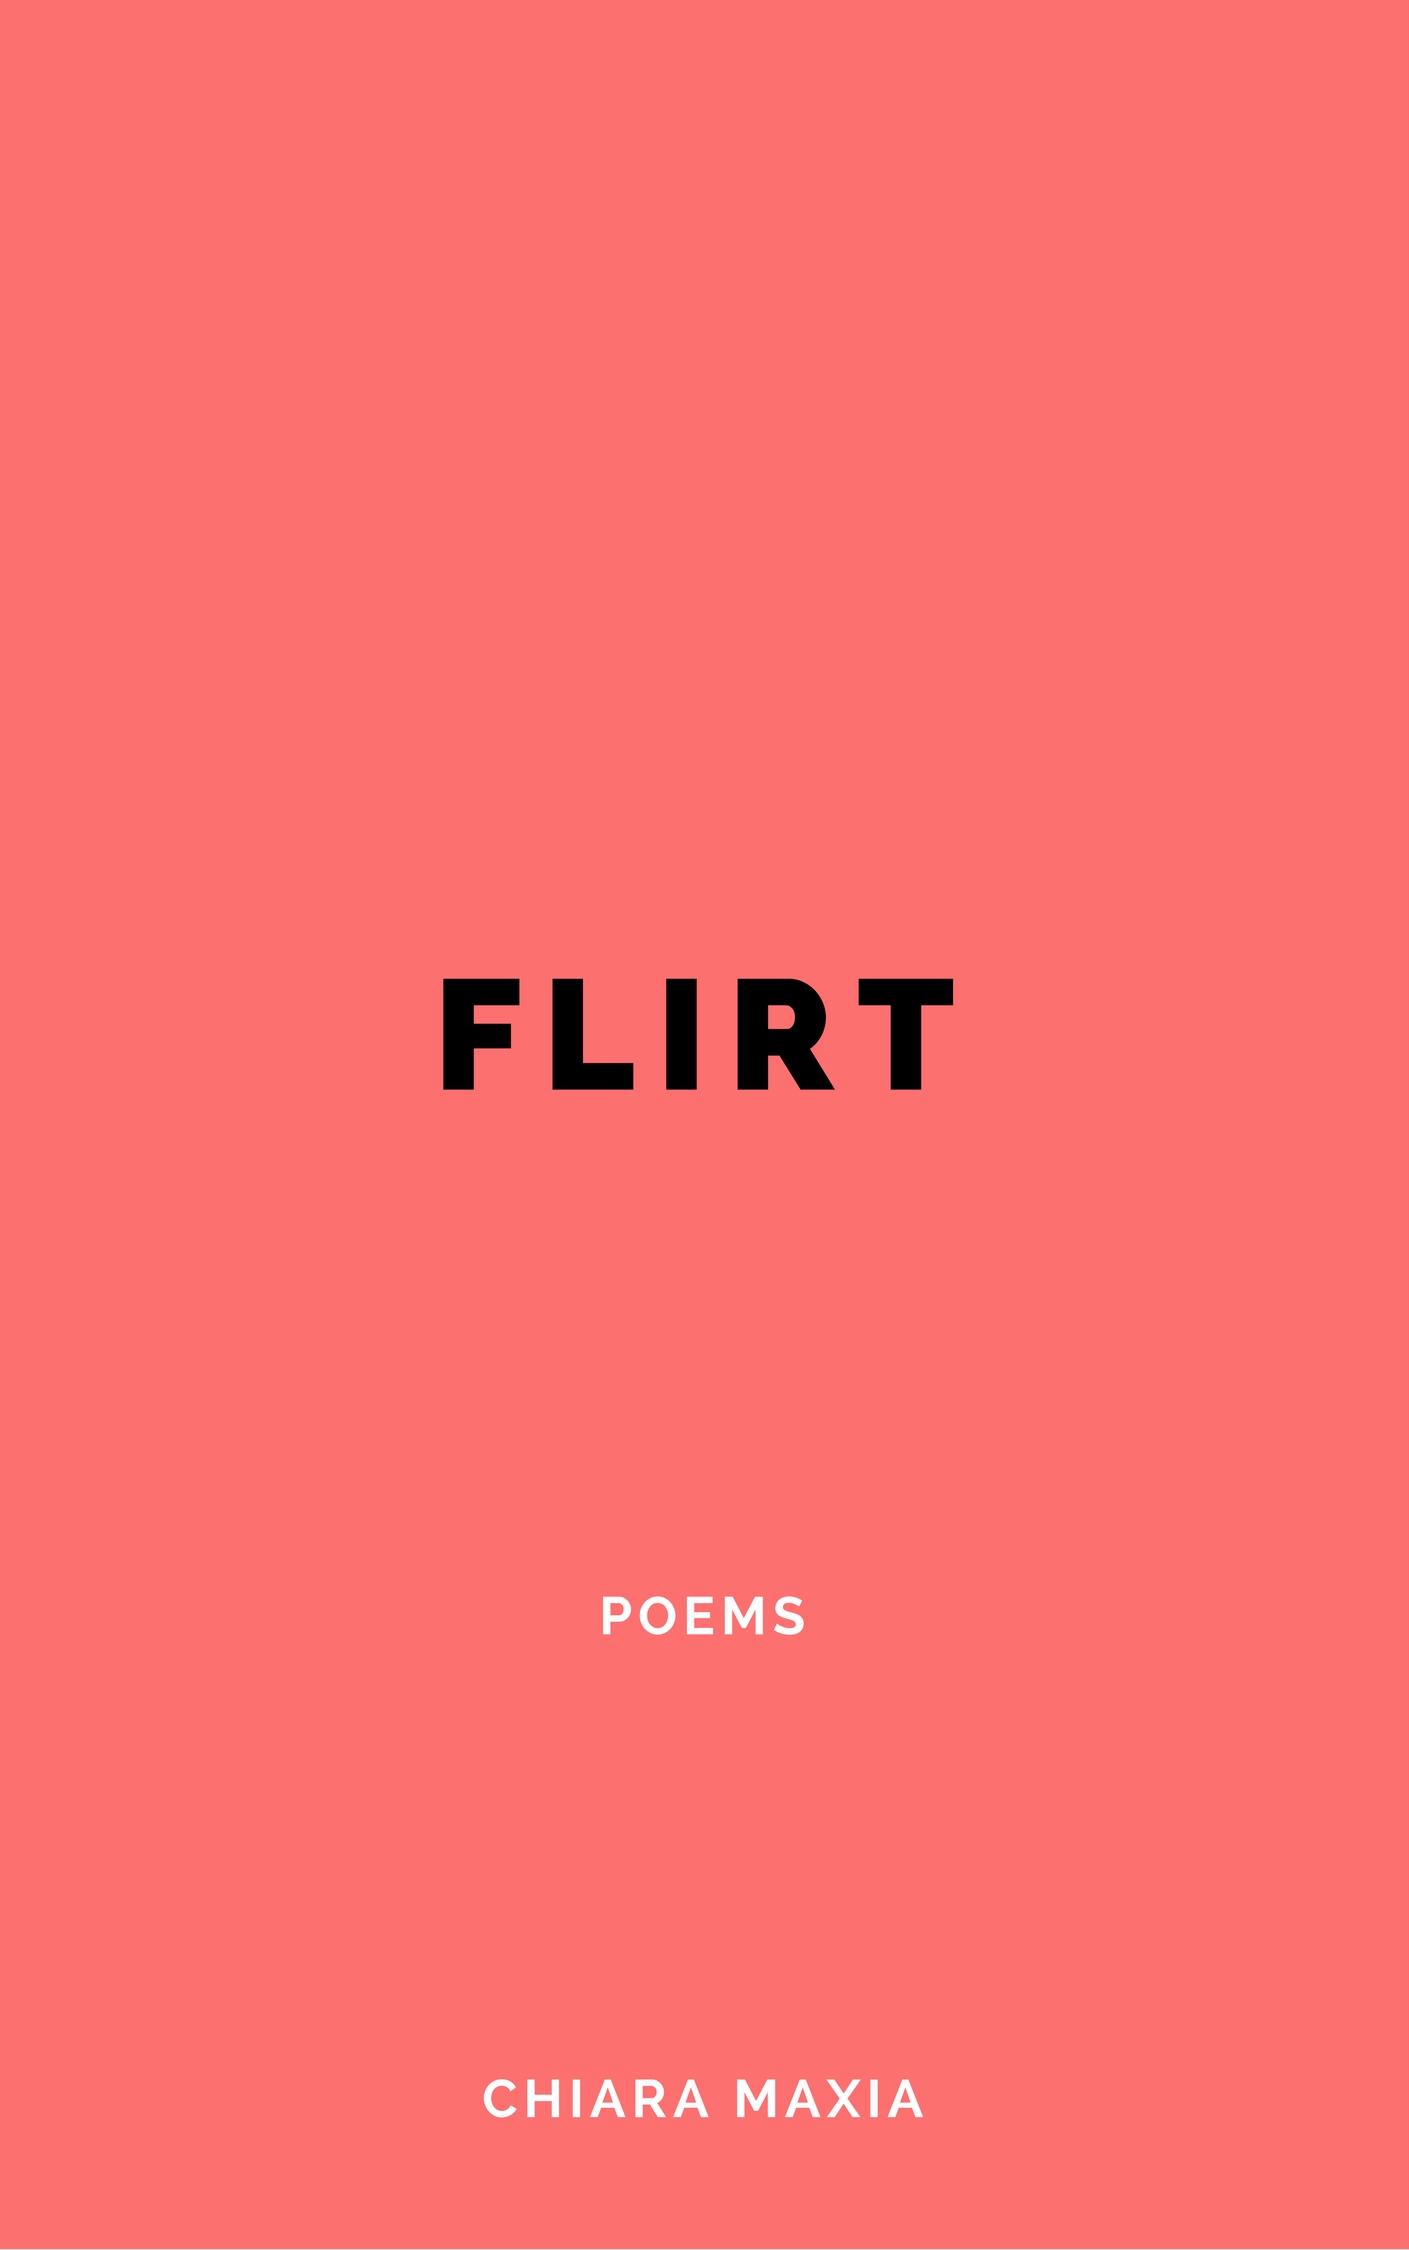 Flirt - Poems of dreams, travels, femininity, loves and lovers.